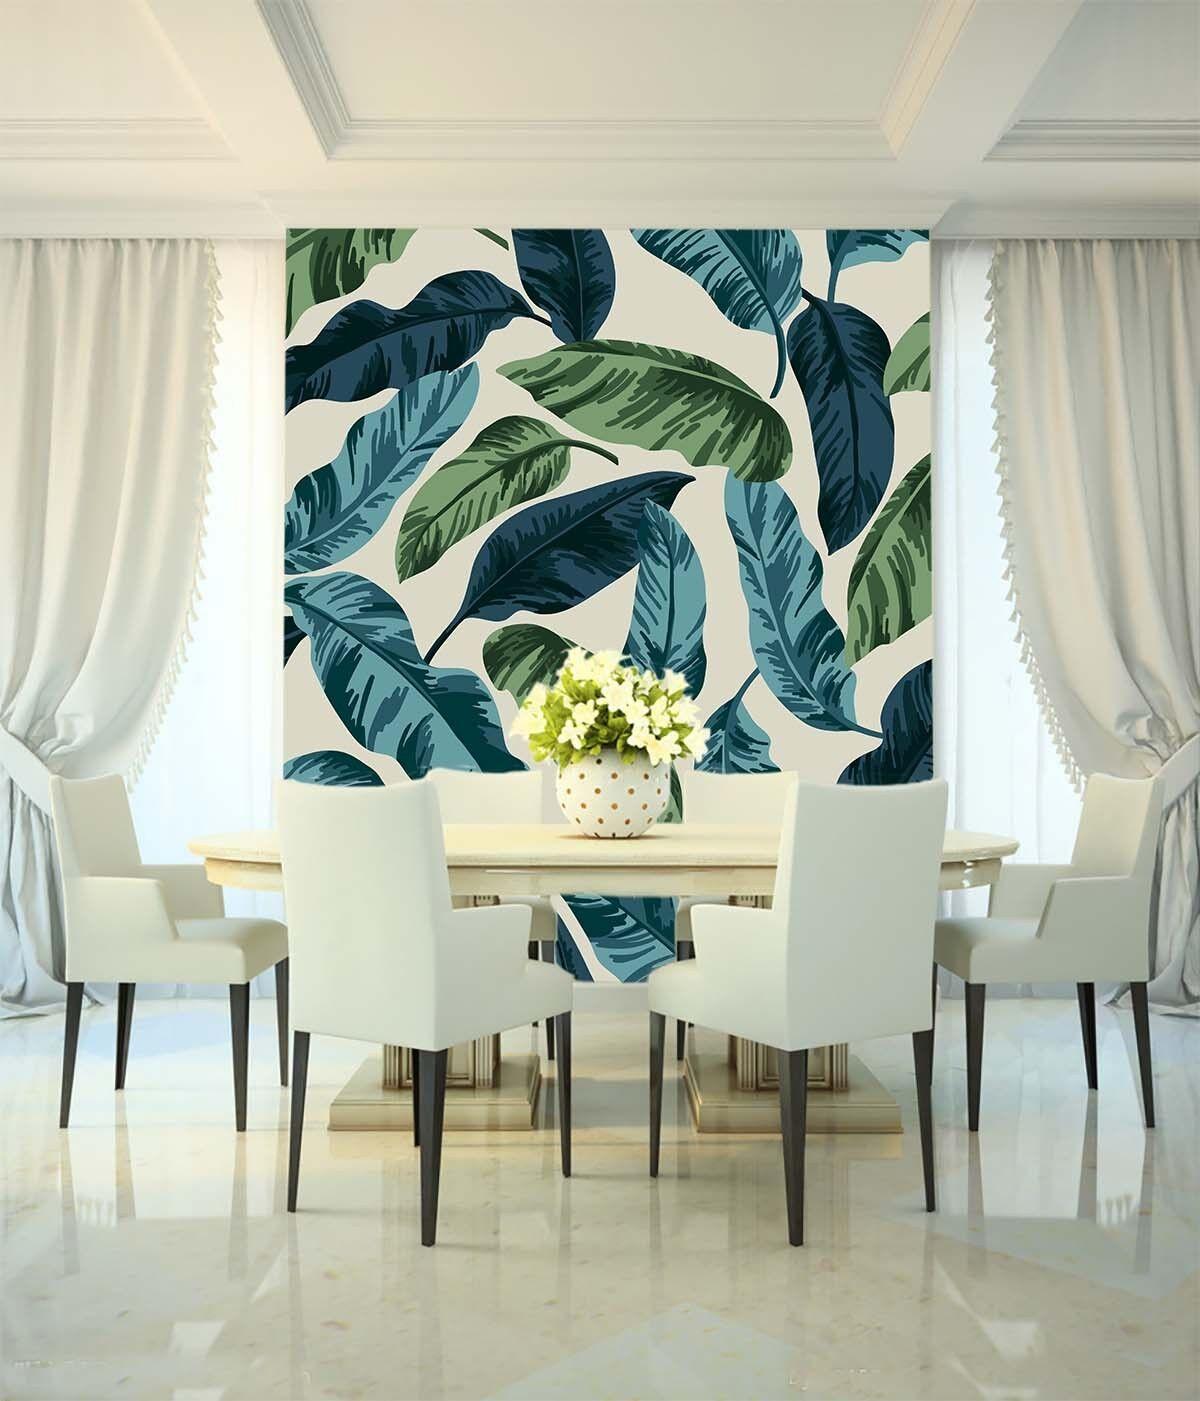 Fashion Foliage Patterns6324 Wall Paper Wall Print Decal Wall Deco Indoor Wall